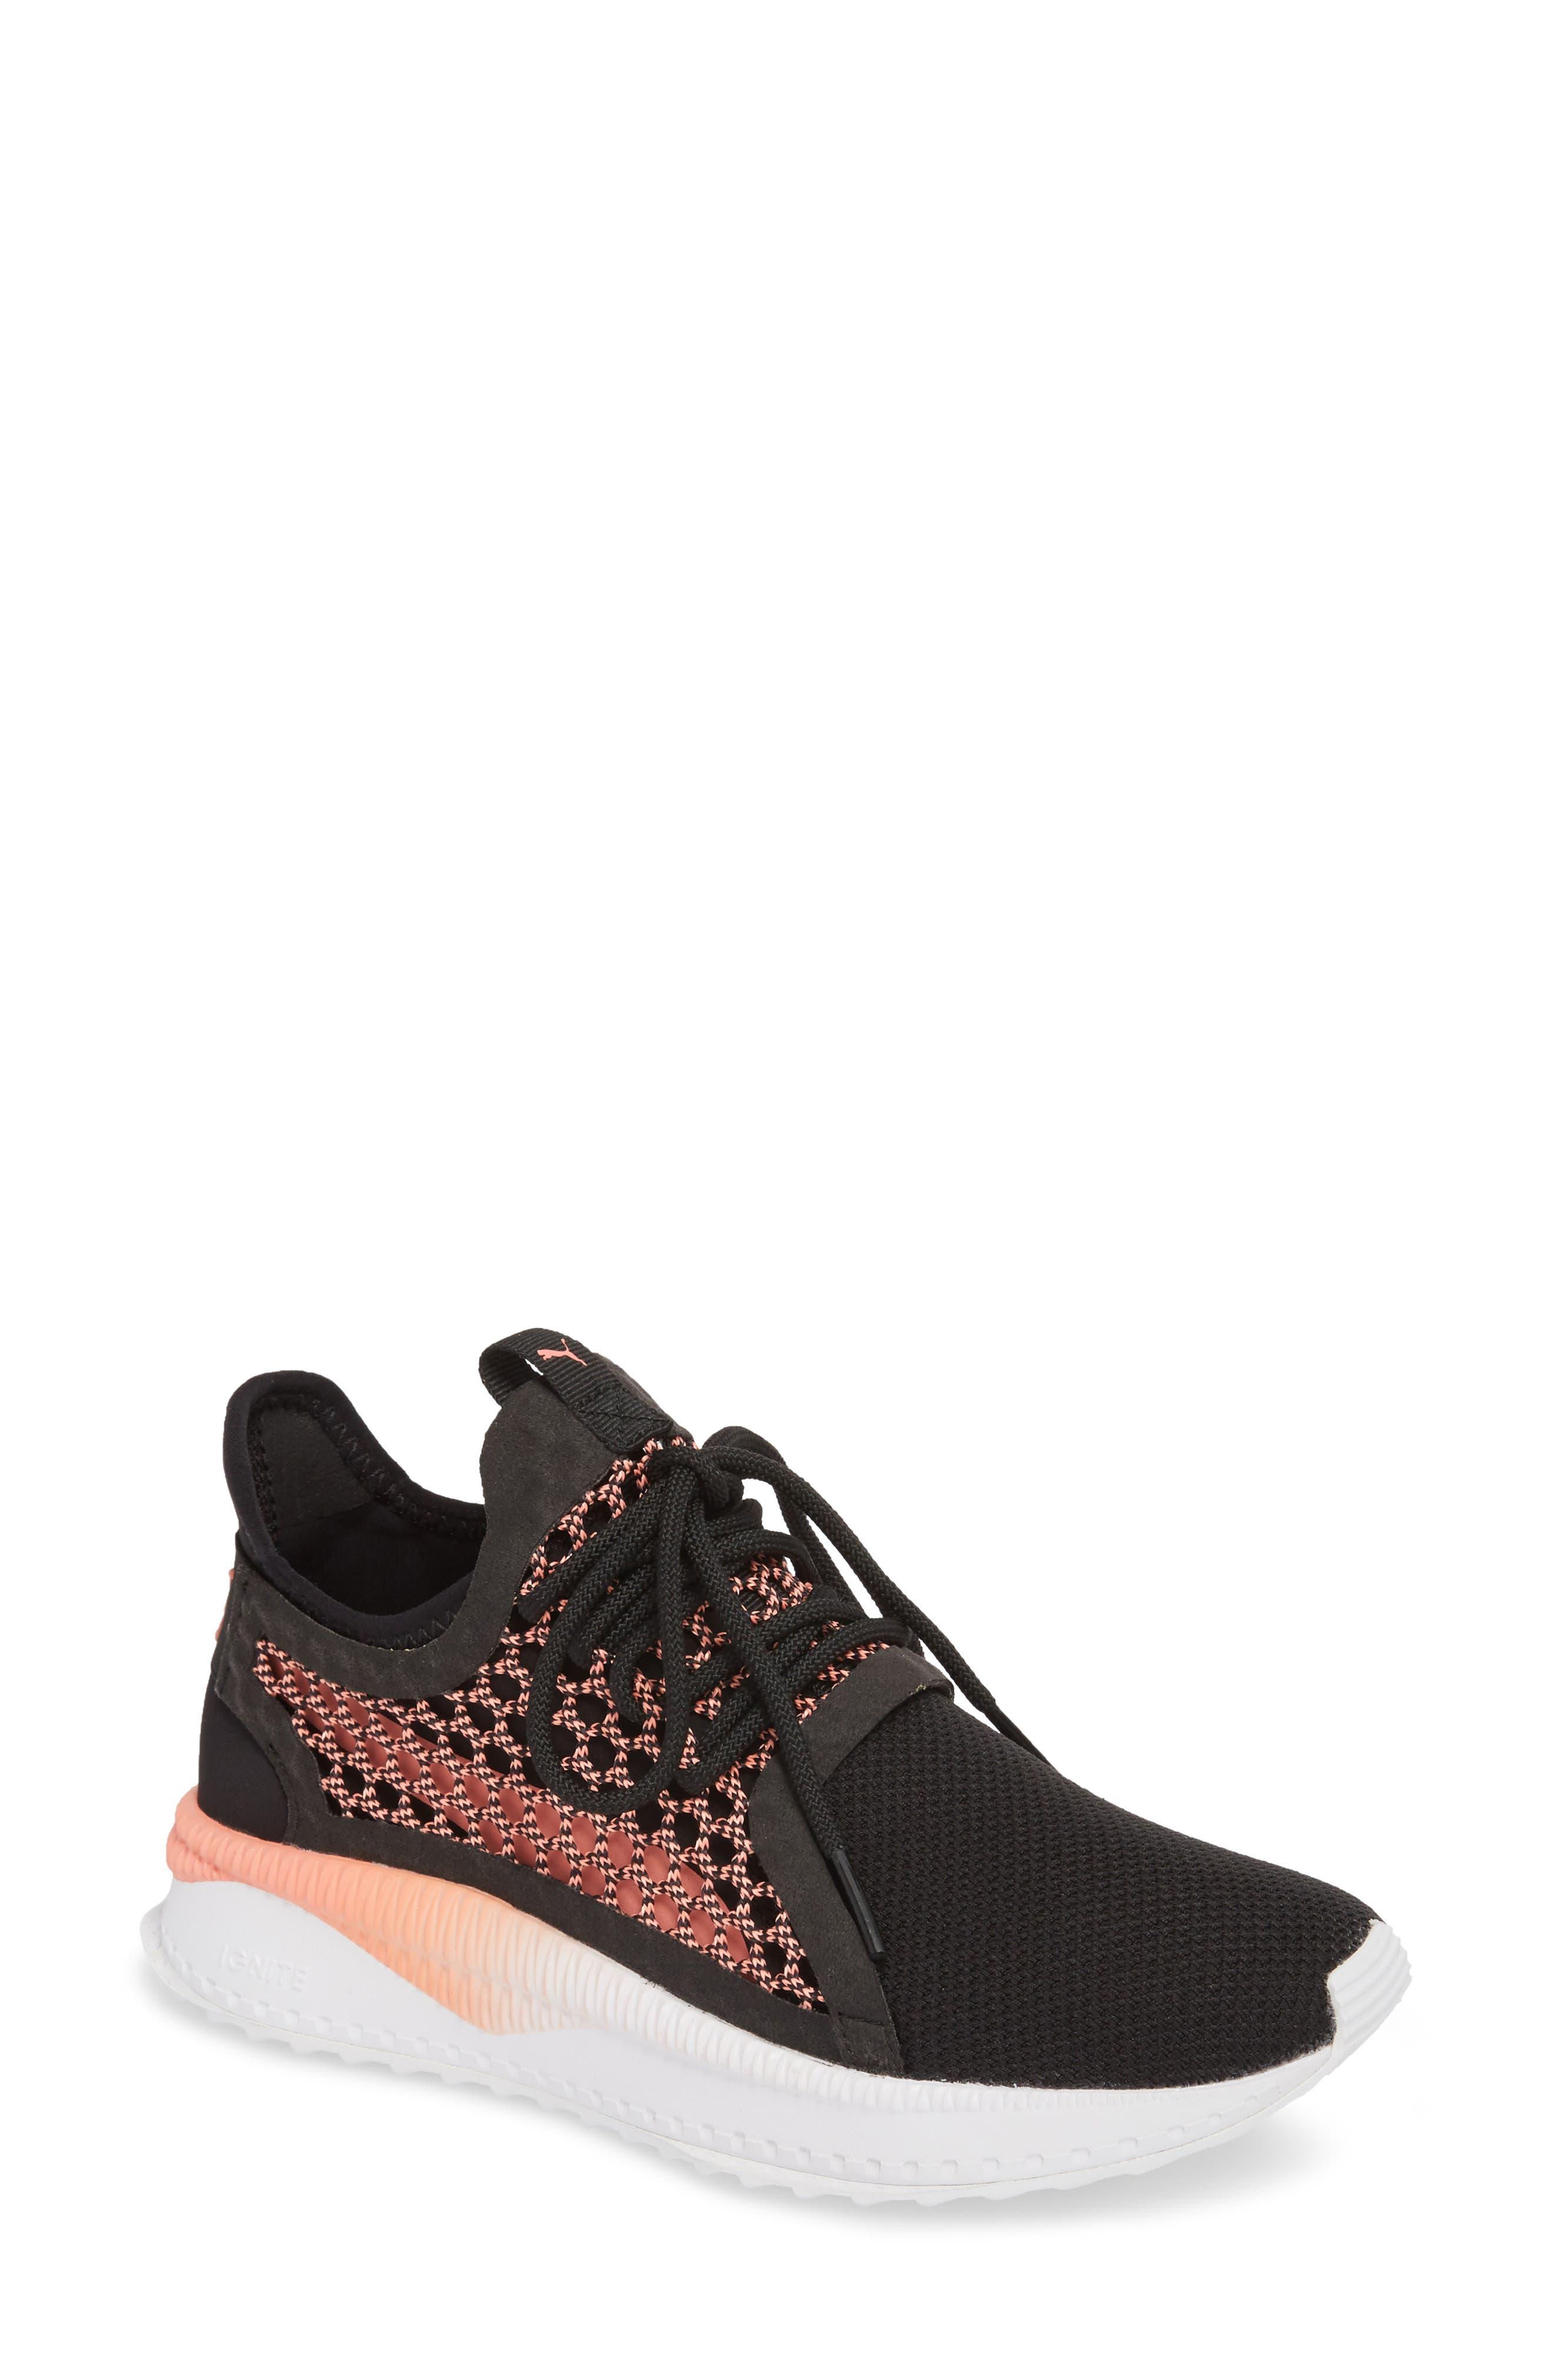 Tsugi Netfit evoKNIT Training Shoe,                         Main,                         color, Black/ Shell Pink/ White